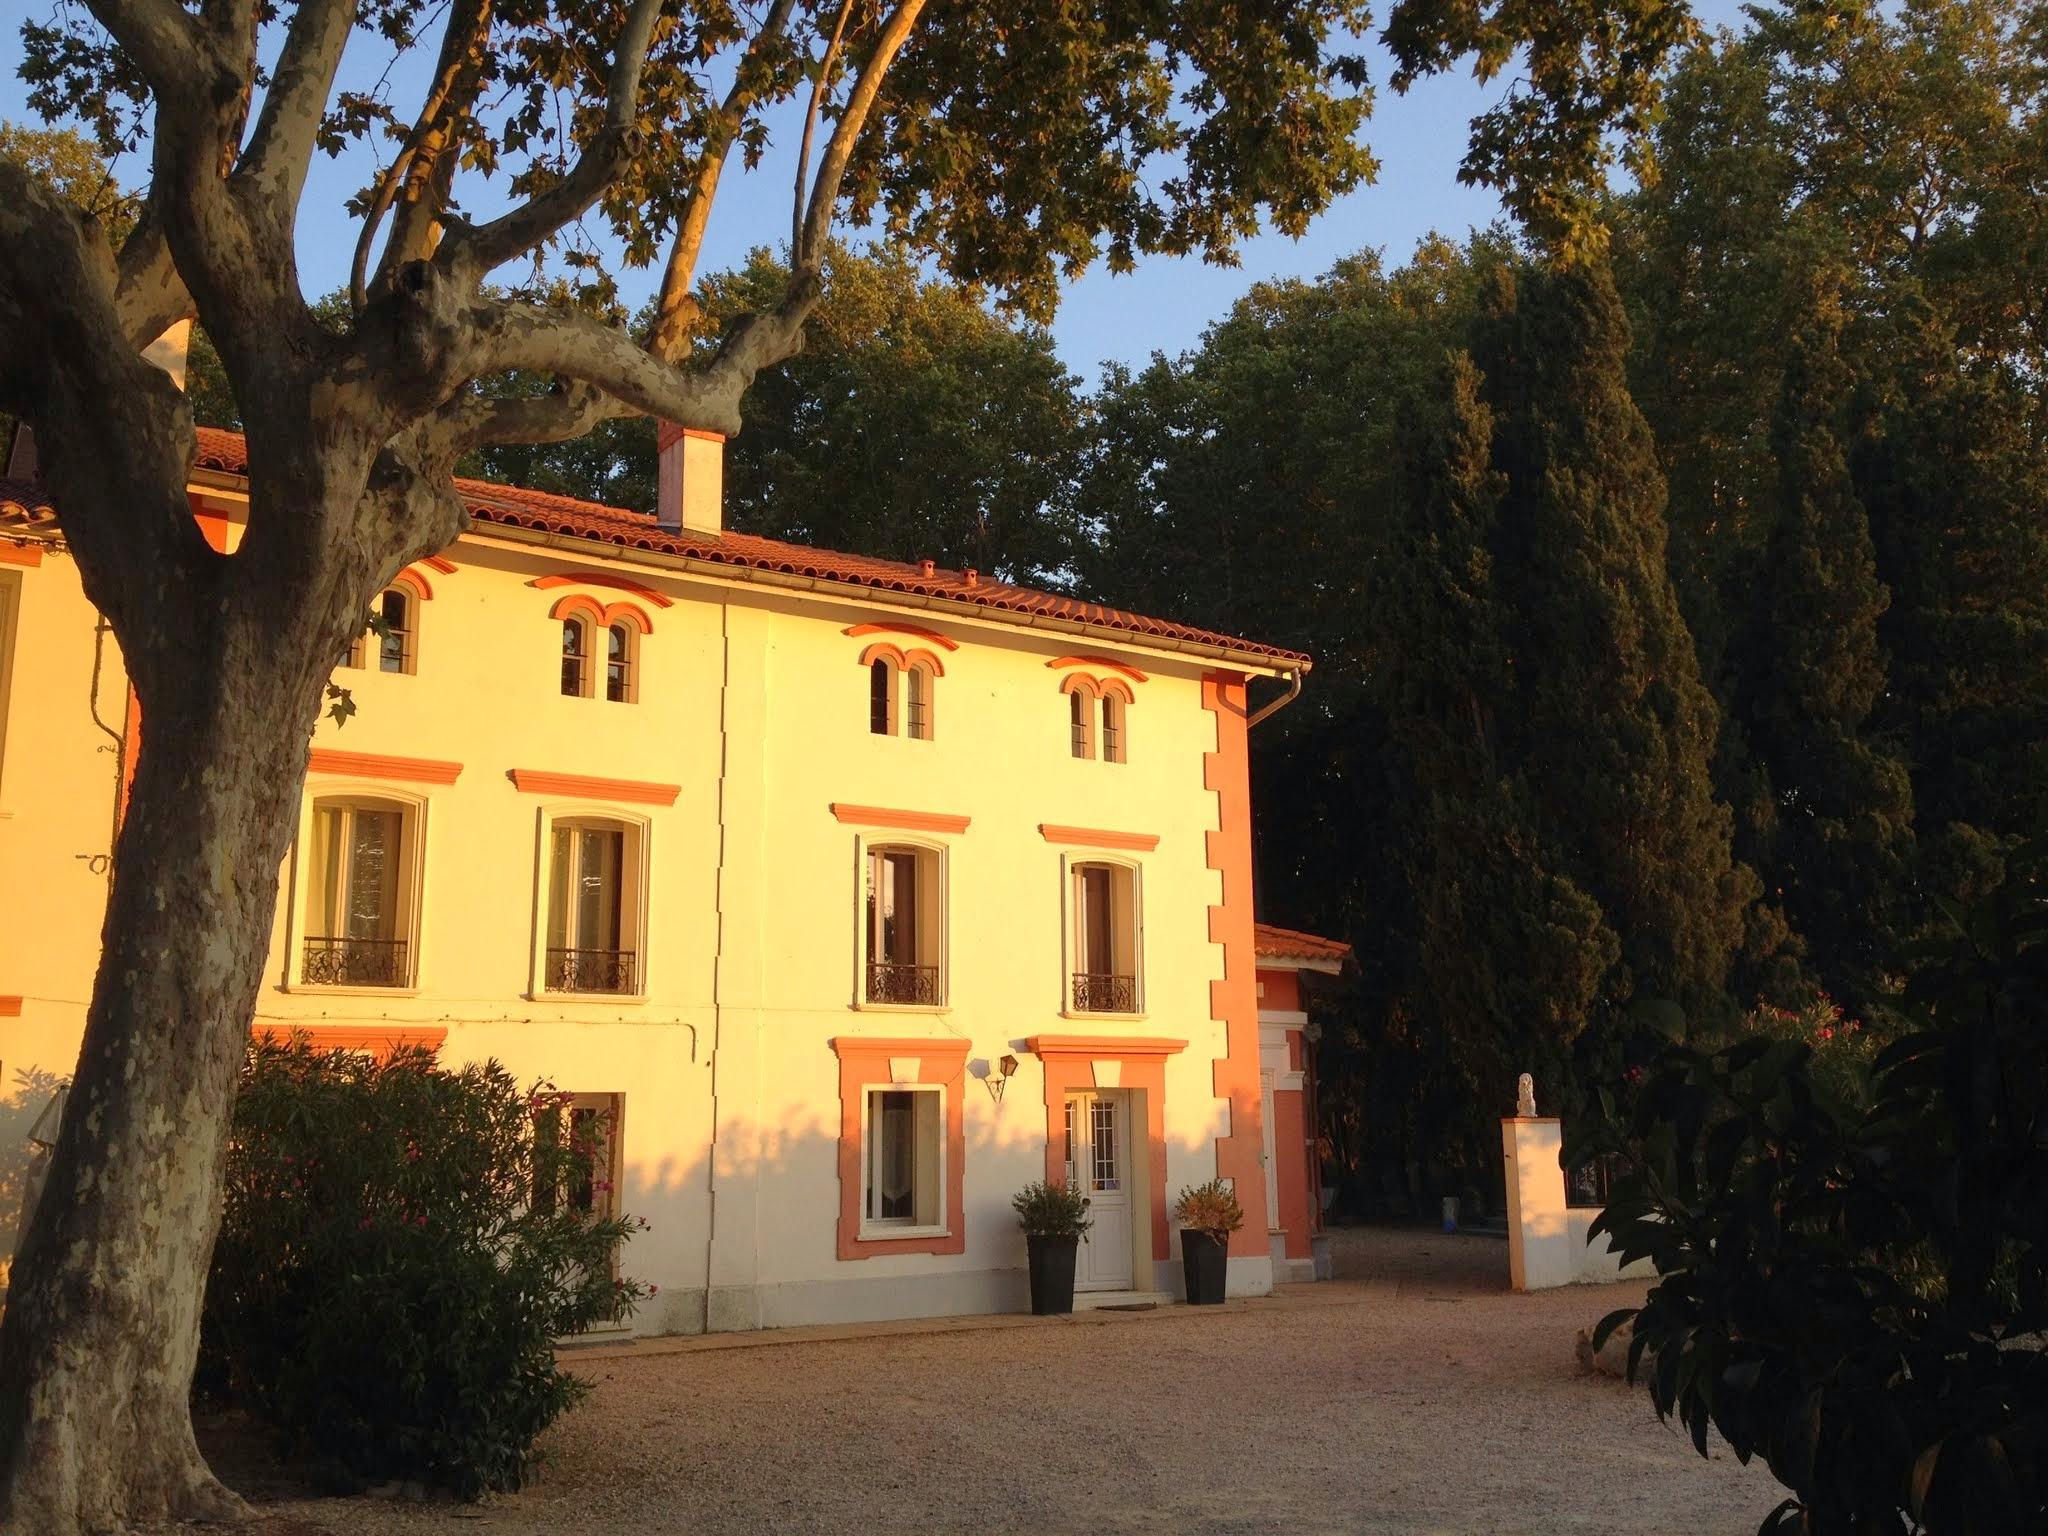 Chambres d 39 h tes proche de collioure castell de bl s for Chambre hote collioure